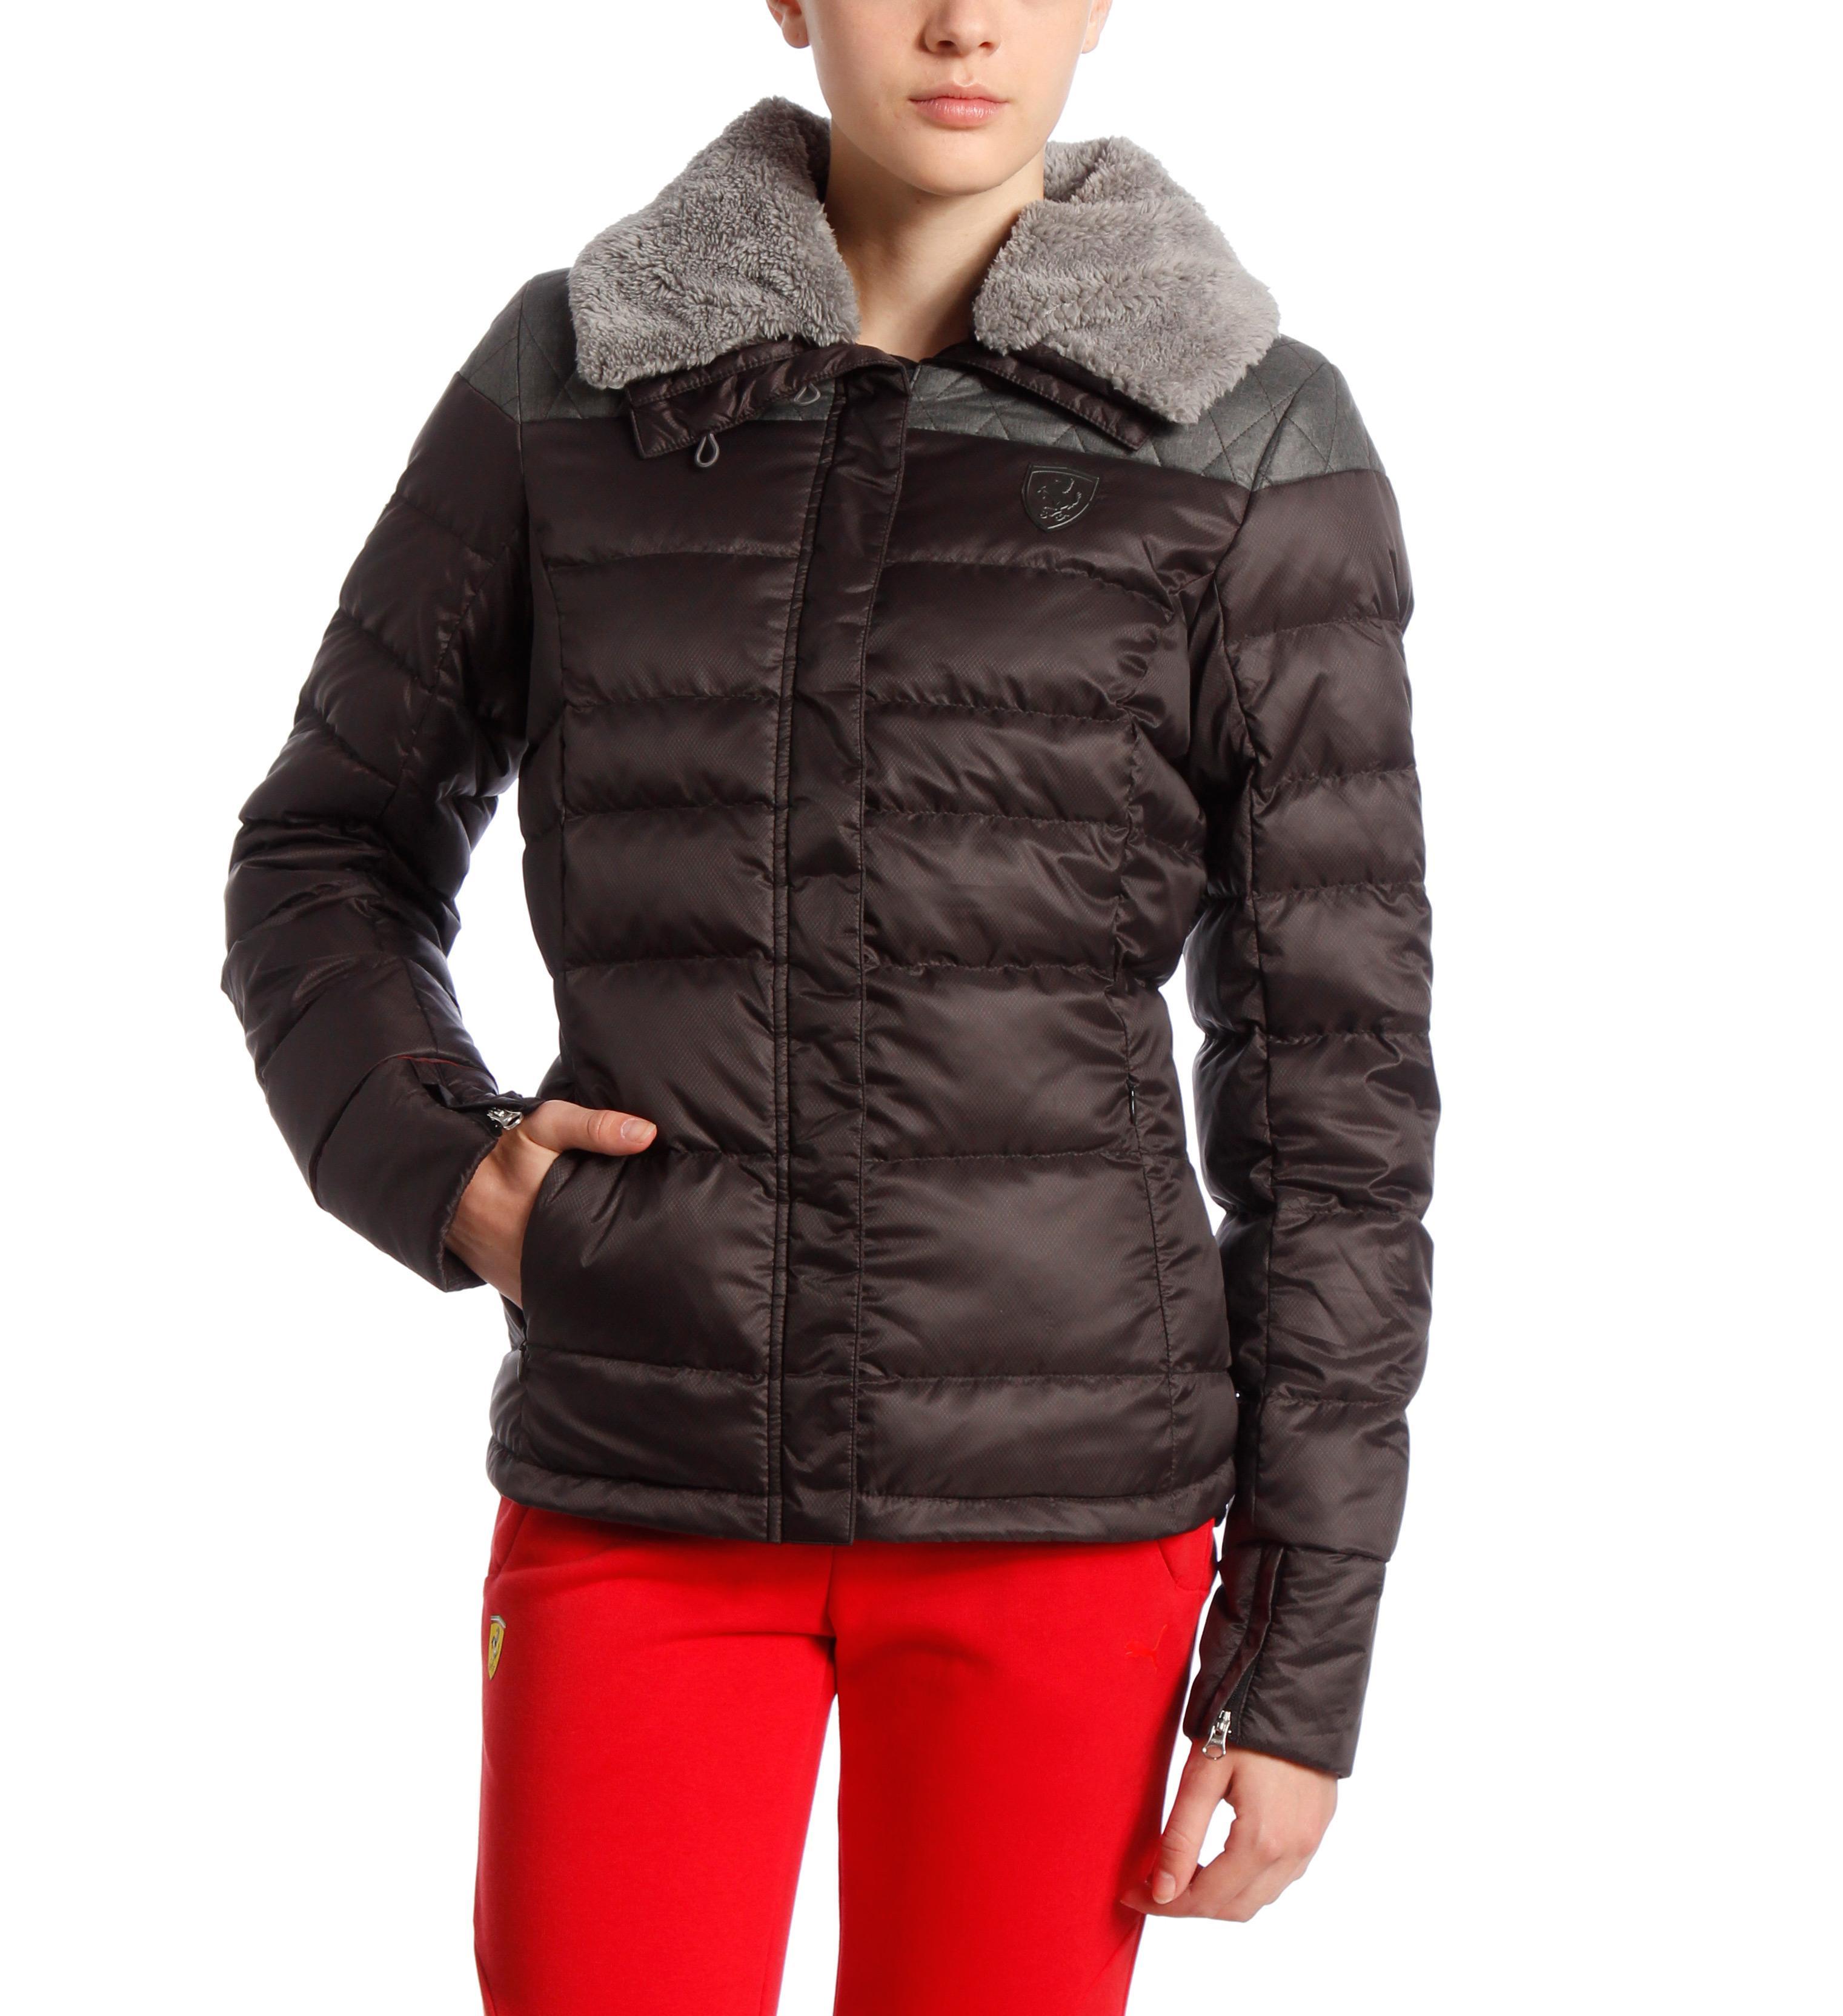 puma ferrari women 39 s down jacket ebay. Black Bedroom Furniture Sets. Home Design Ideas